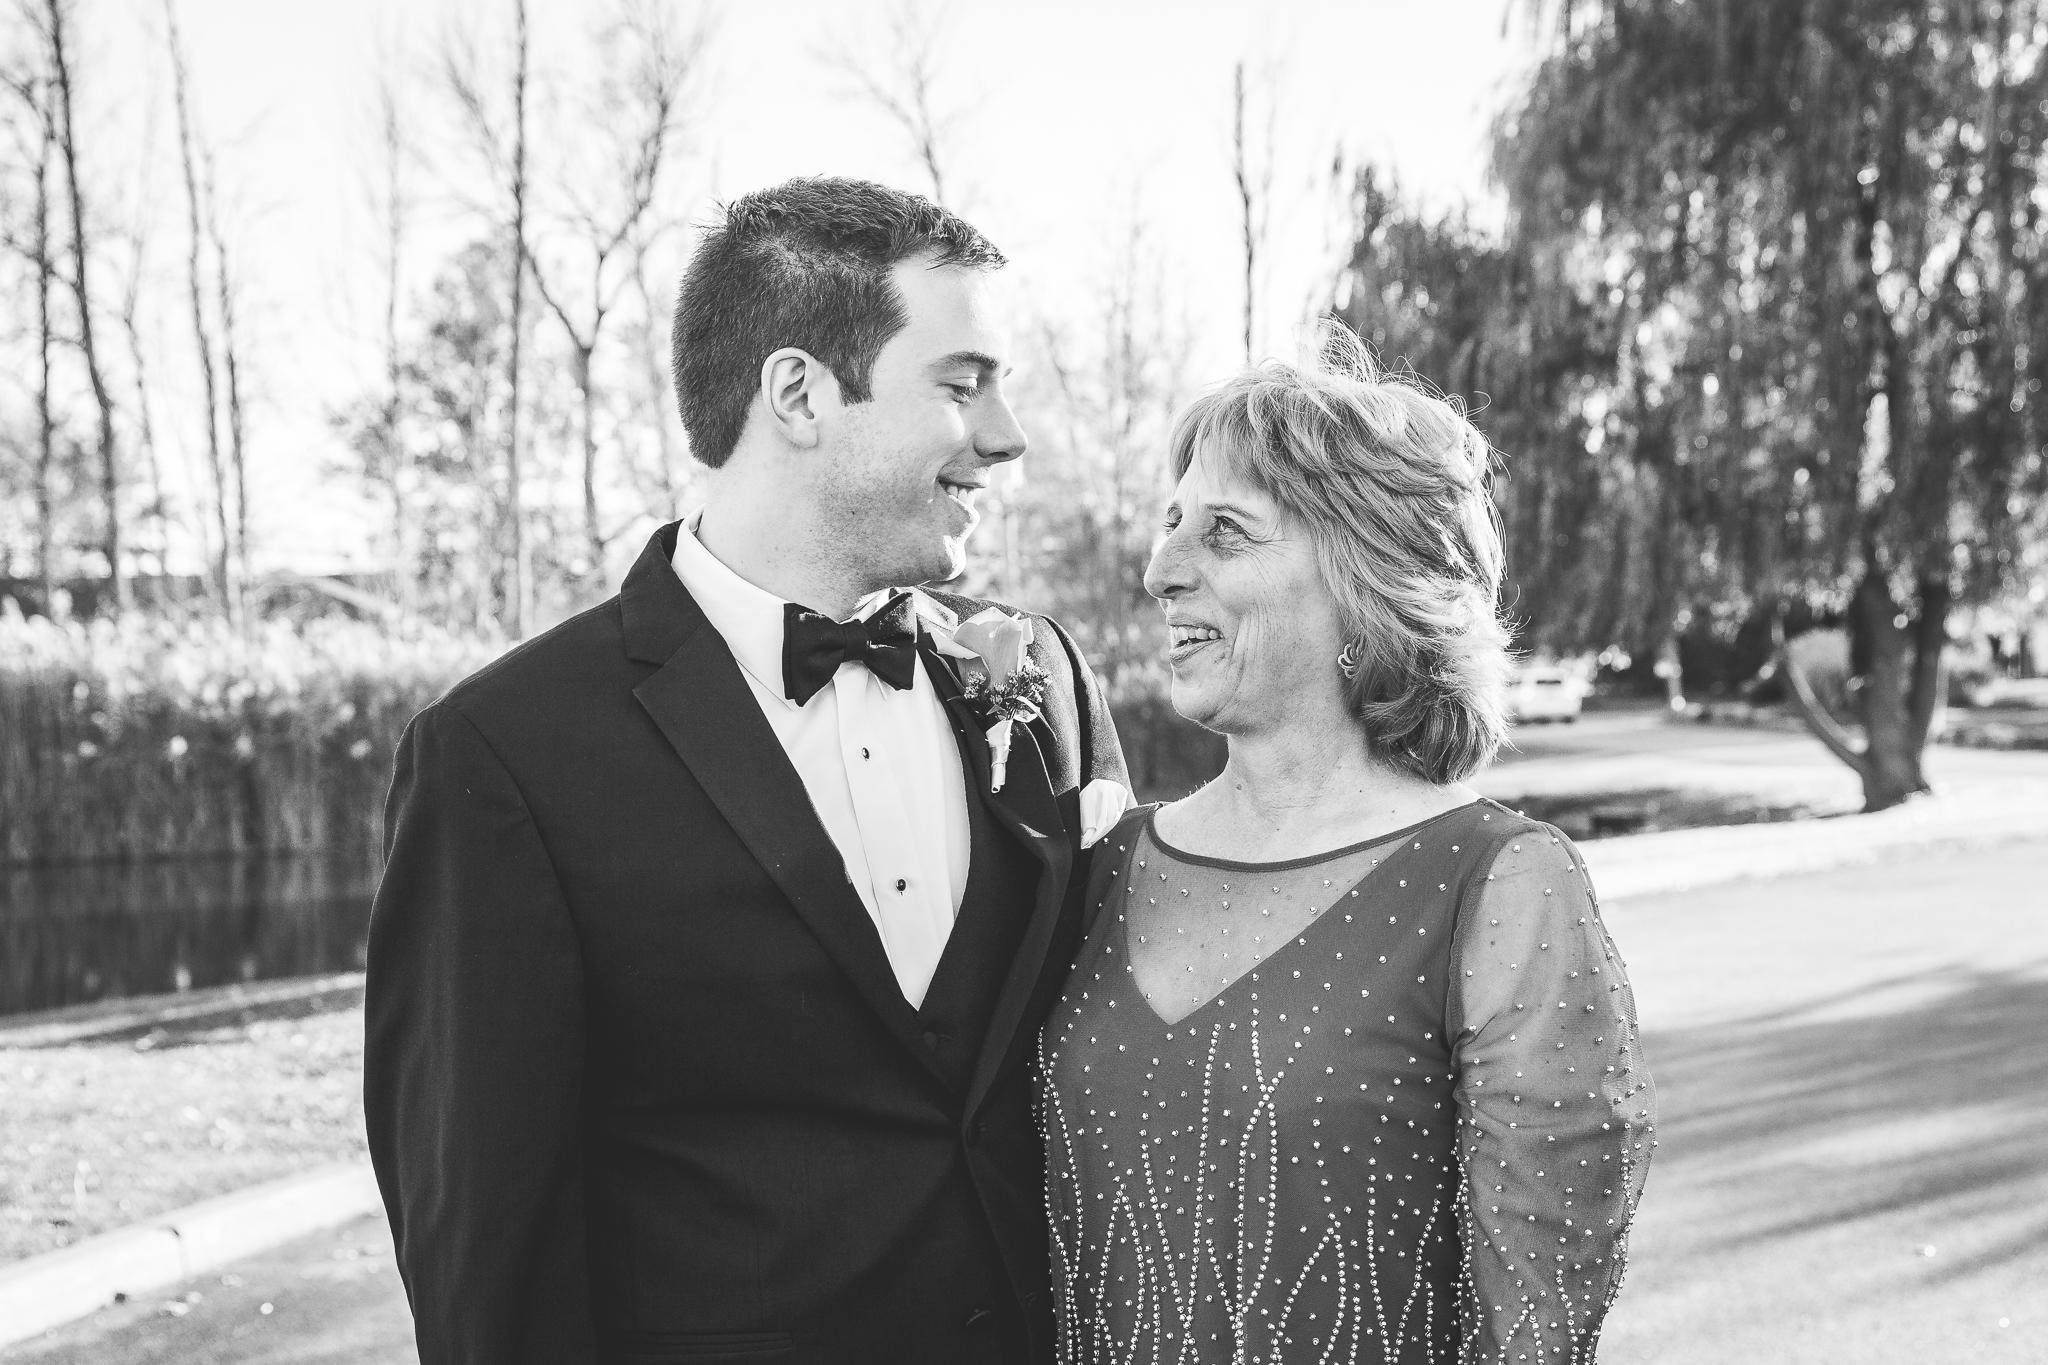 camuglia-whomstudio-chelsea_and_andy-nycphotographer-wedding-brooklyn-buffalo-timberlodge-038-0238.jpg